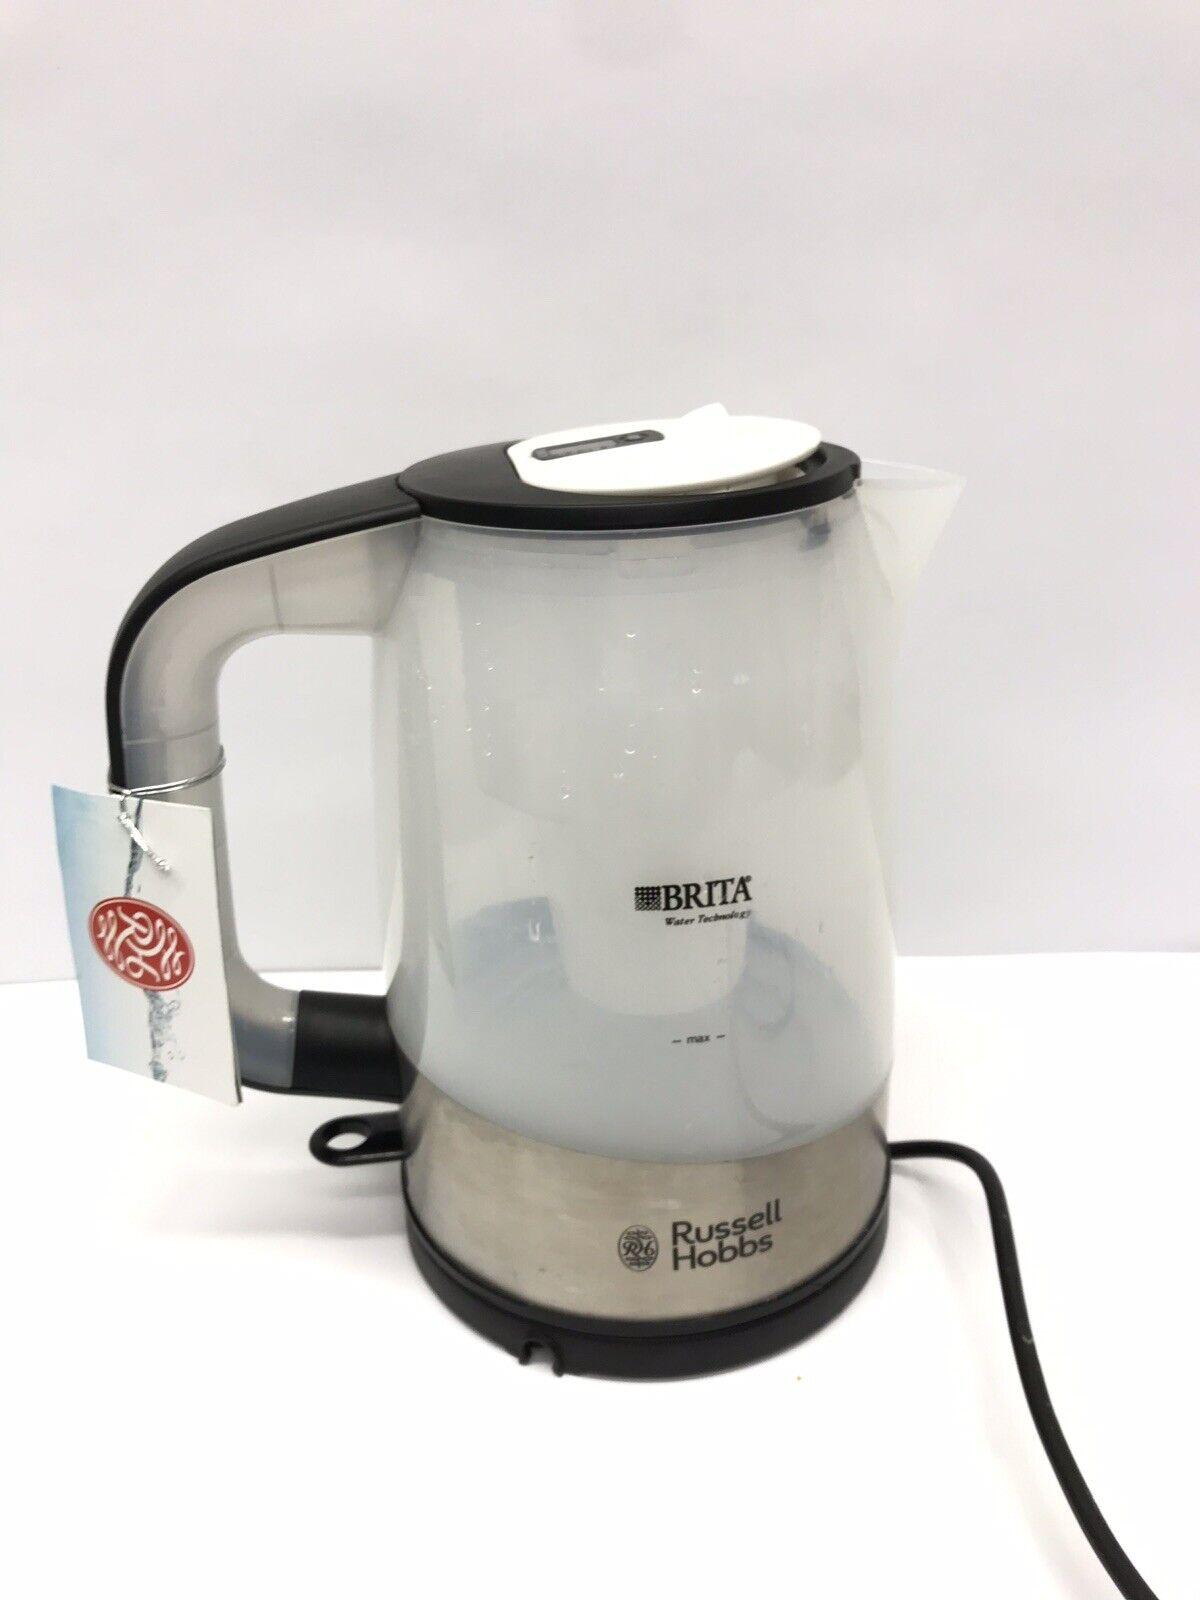 RUSSELL HOBBS Wasserkocher 22850-70 PURITY 1.5l inkl Brita Wasserfilter